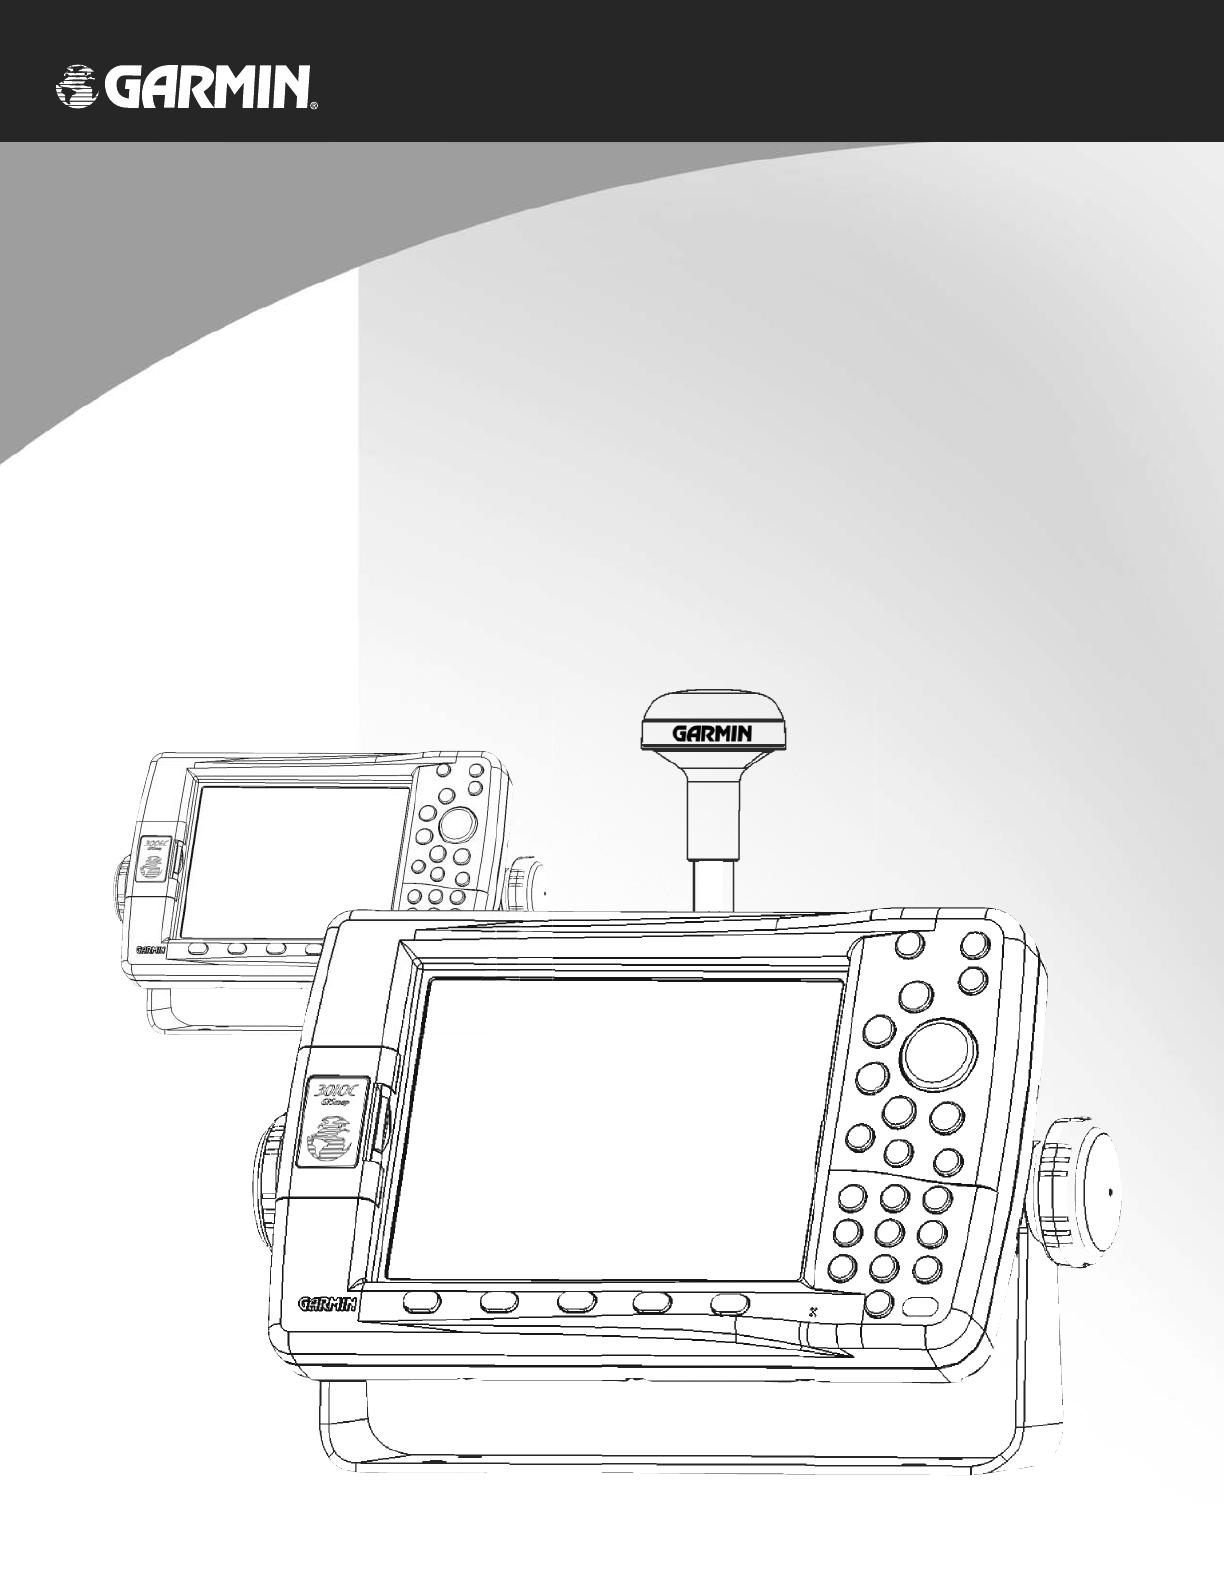 garmin 3010c wiring diagram